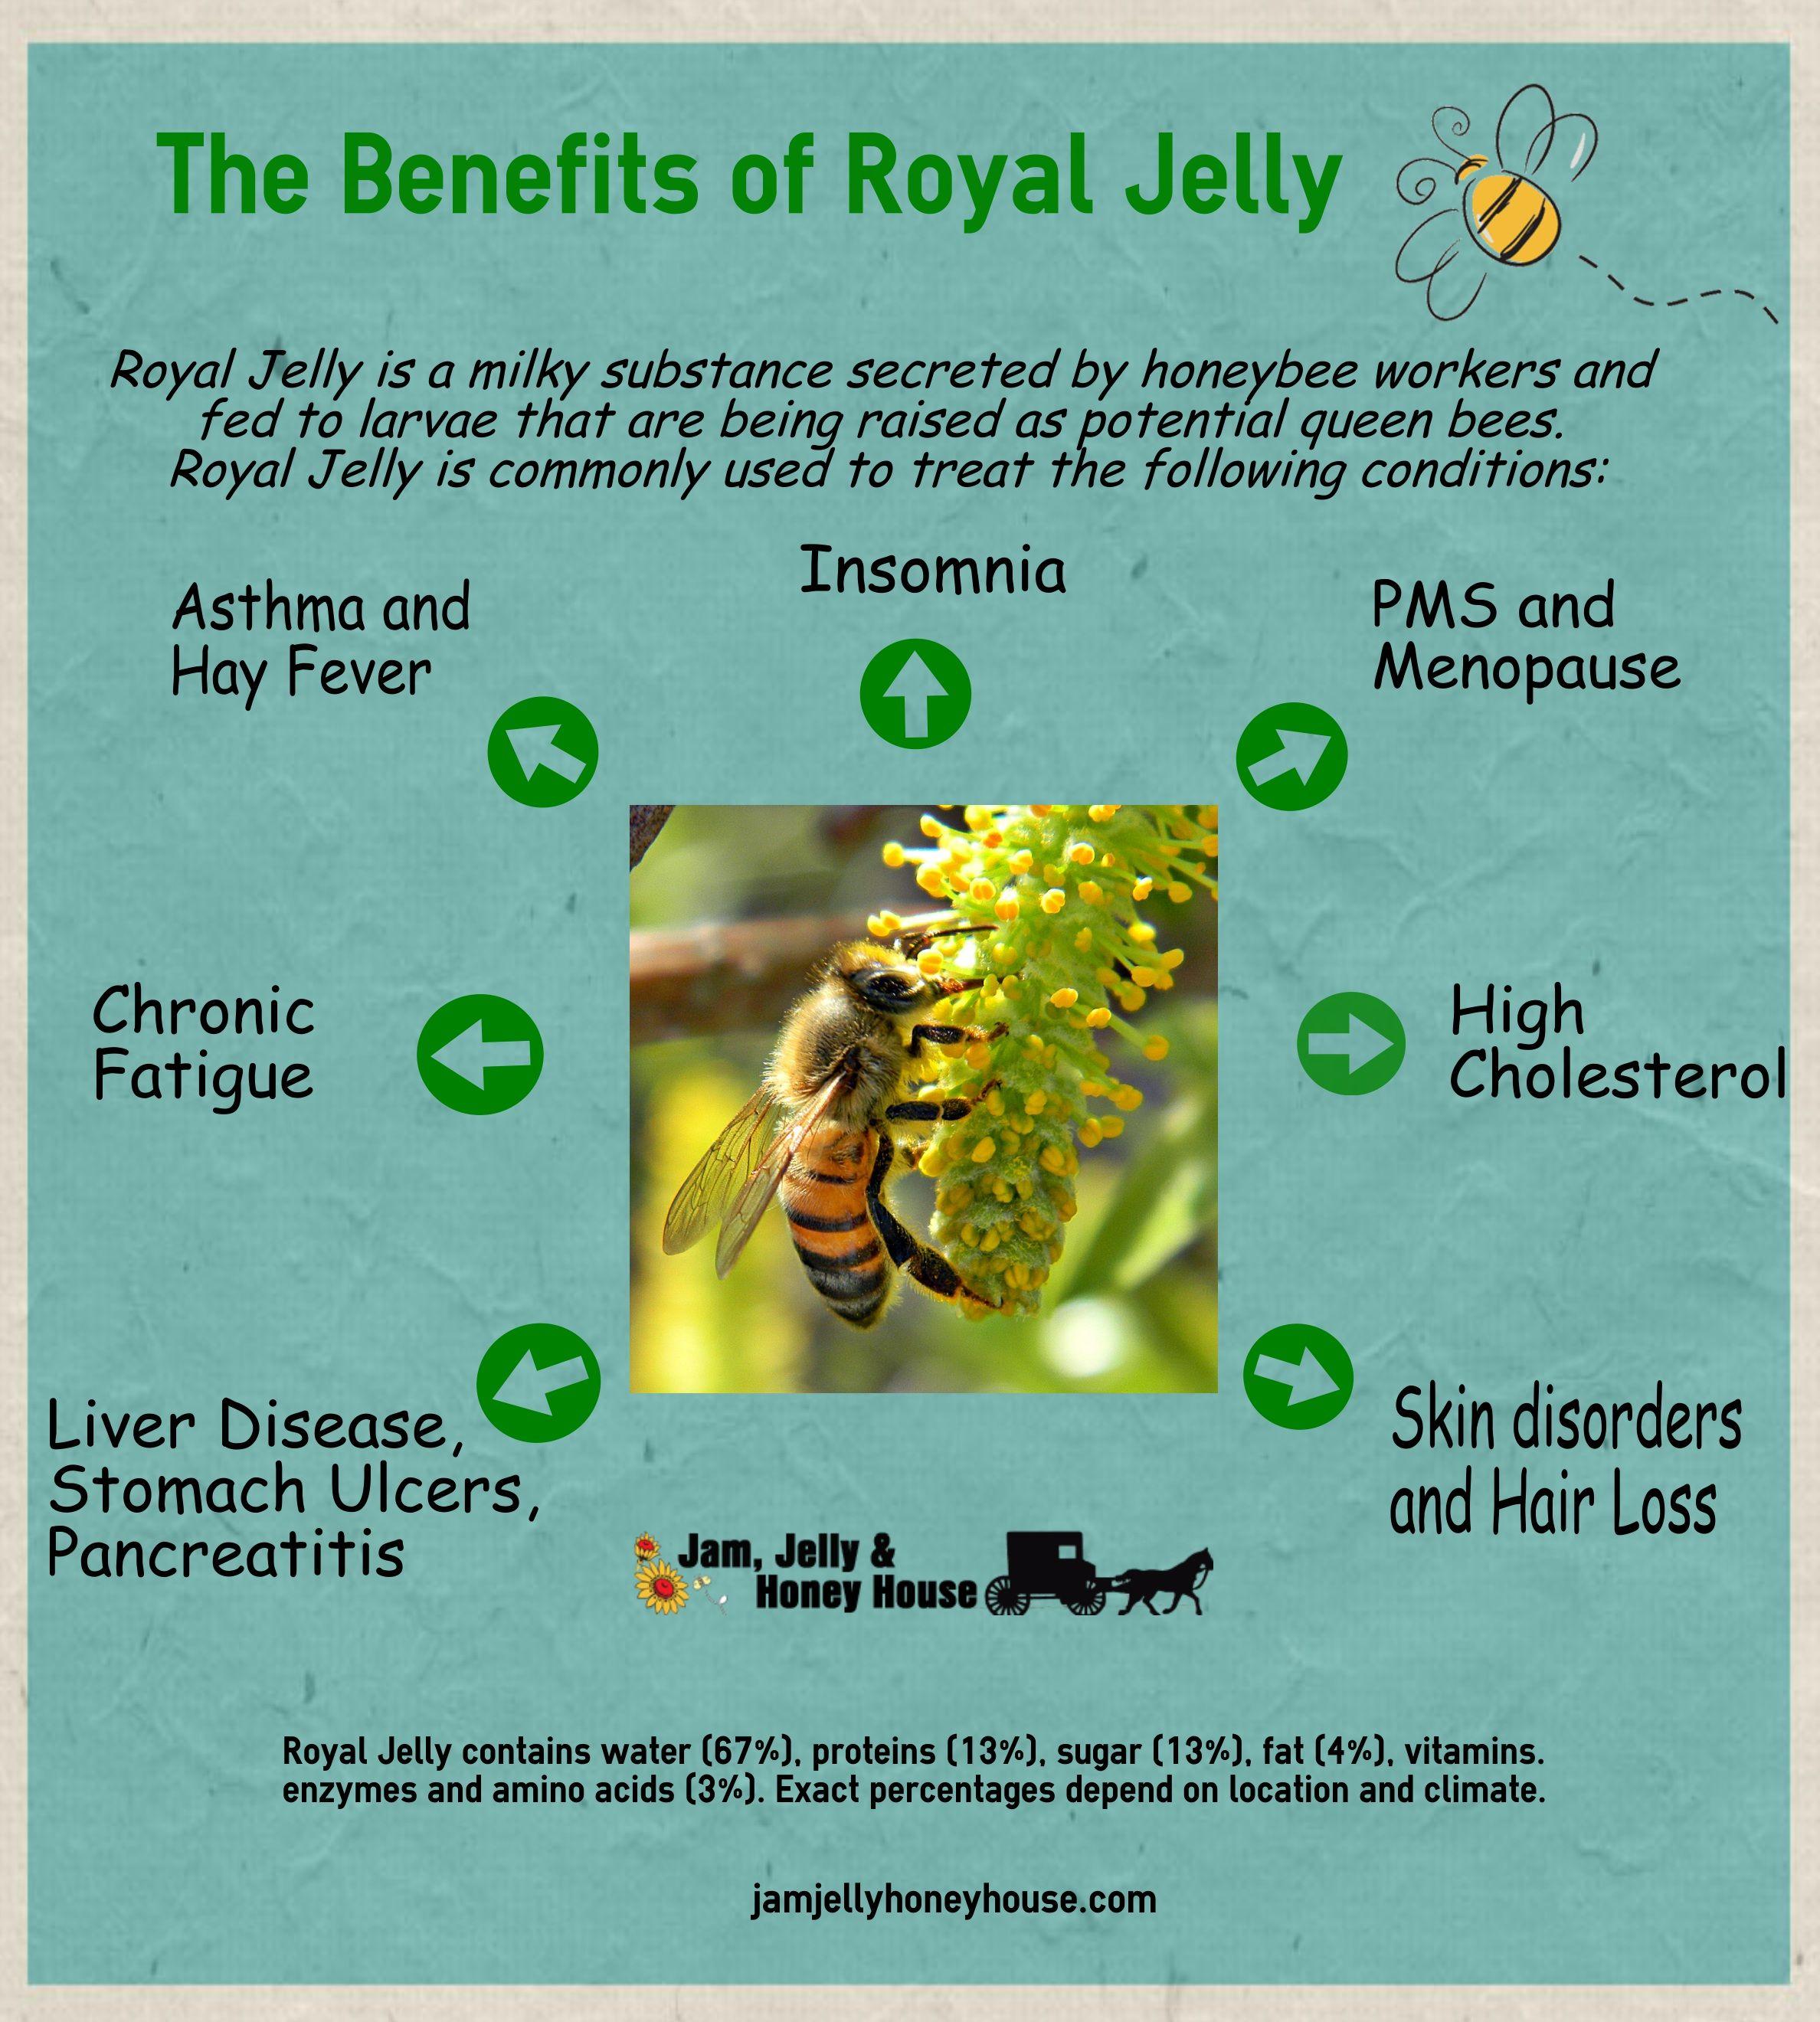 Amazing benefits of Royal Jelly!   Royal Jelly   Pinterest ... - photo#18